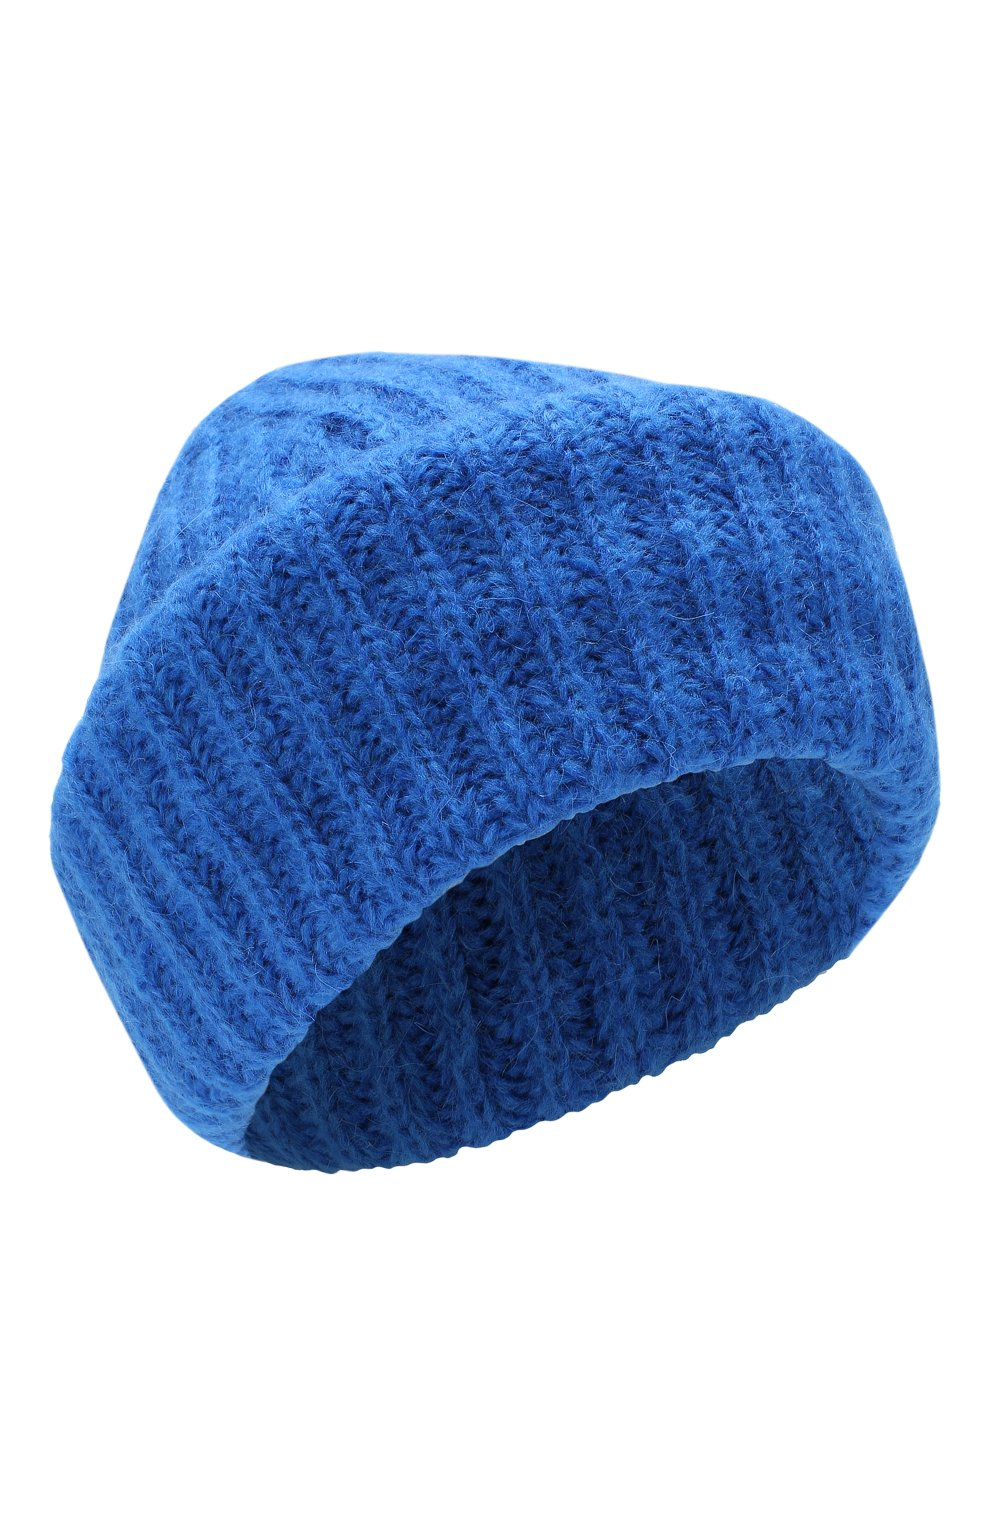 Женская шапка TAK.ORI синего цвета, арт. HTK30043MA030PF18   Фото 1 (Материал: Текстиль, Шерсть, Синтетический материал; Статус проверки: Проверено, Проверена категория)